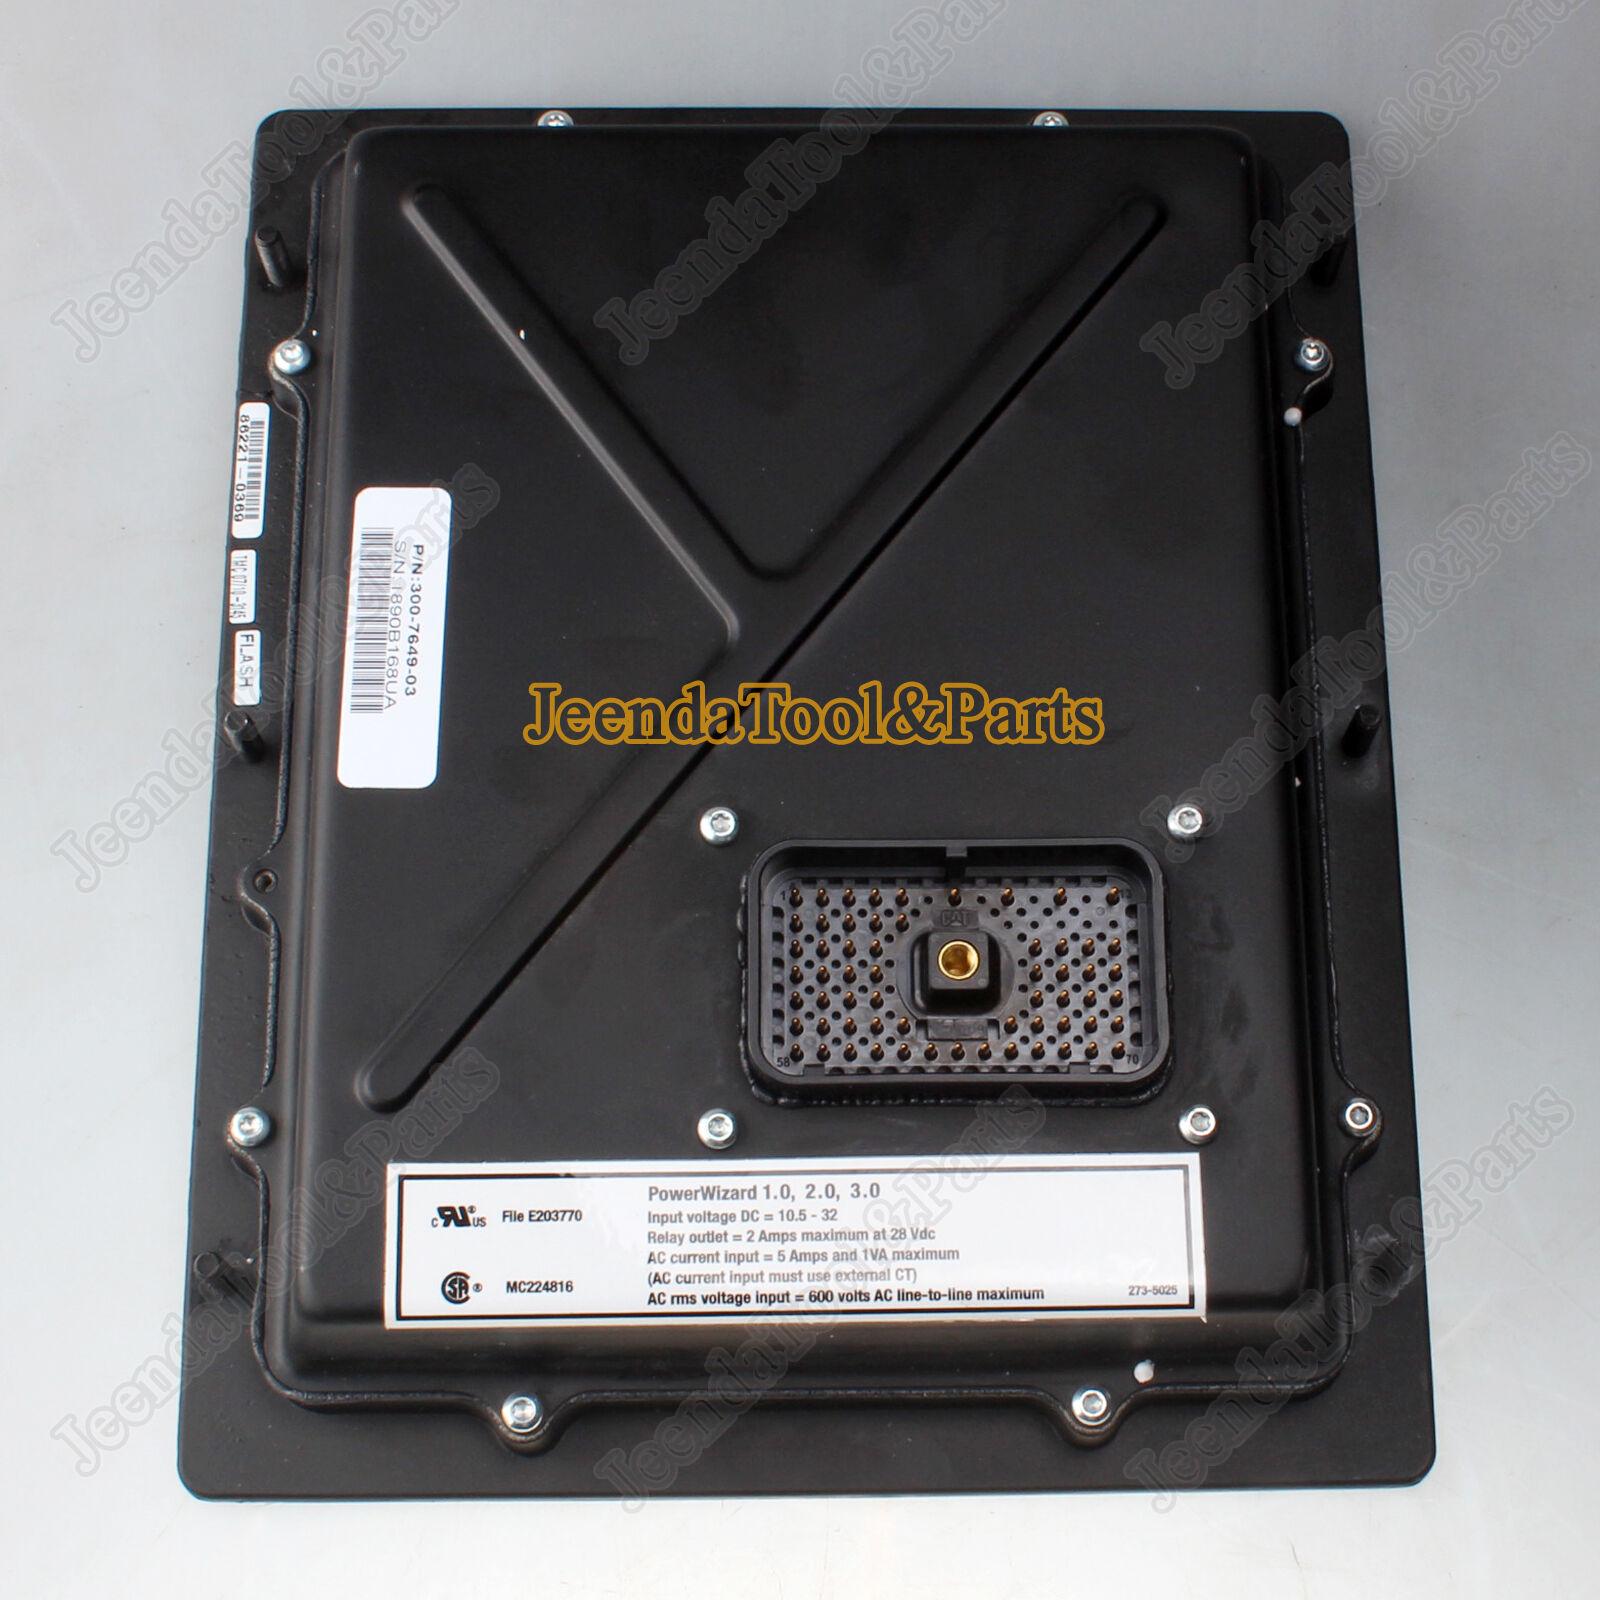 olympian generator control panel wiring diagram 05 altima